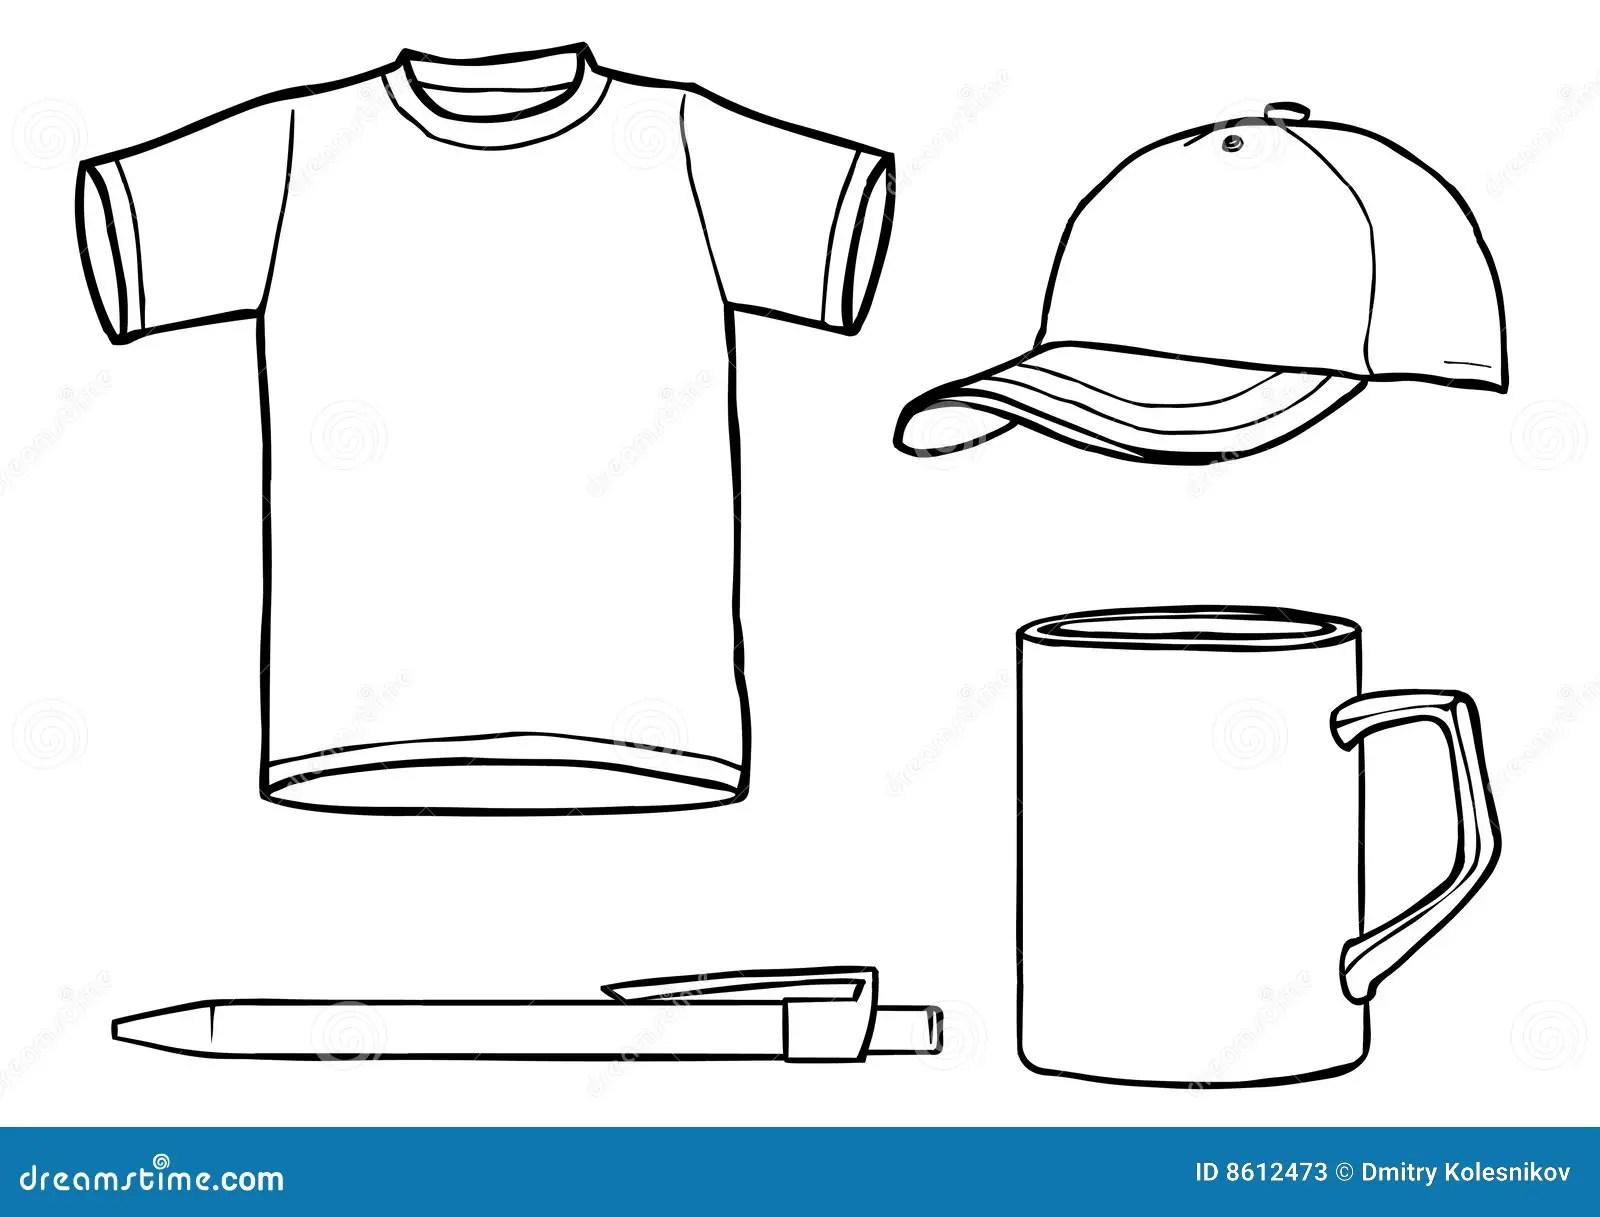 Outline Template Shirt, Cap, Mug, A Pen Stock Image